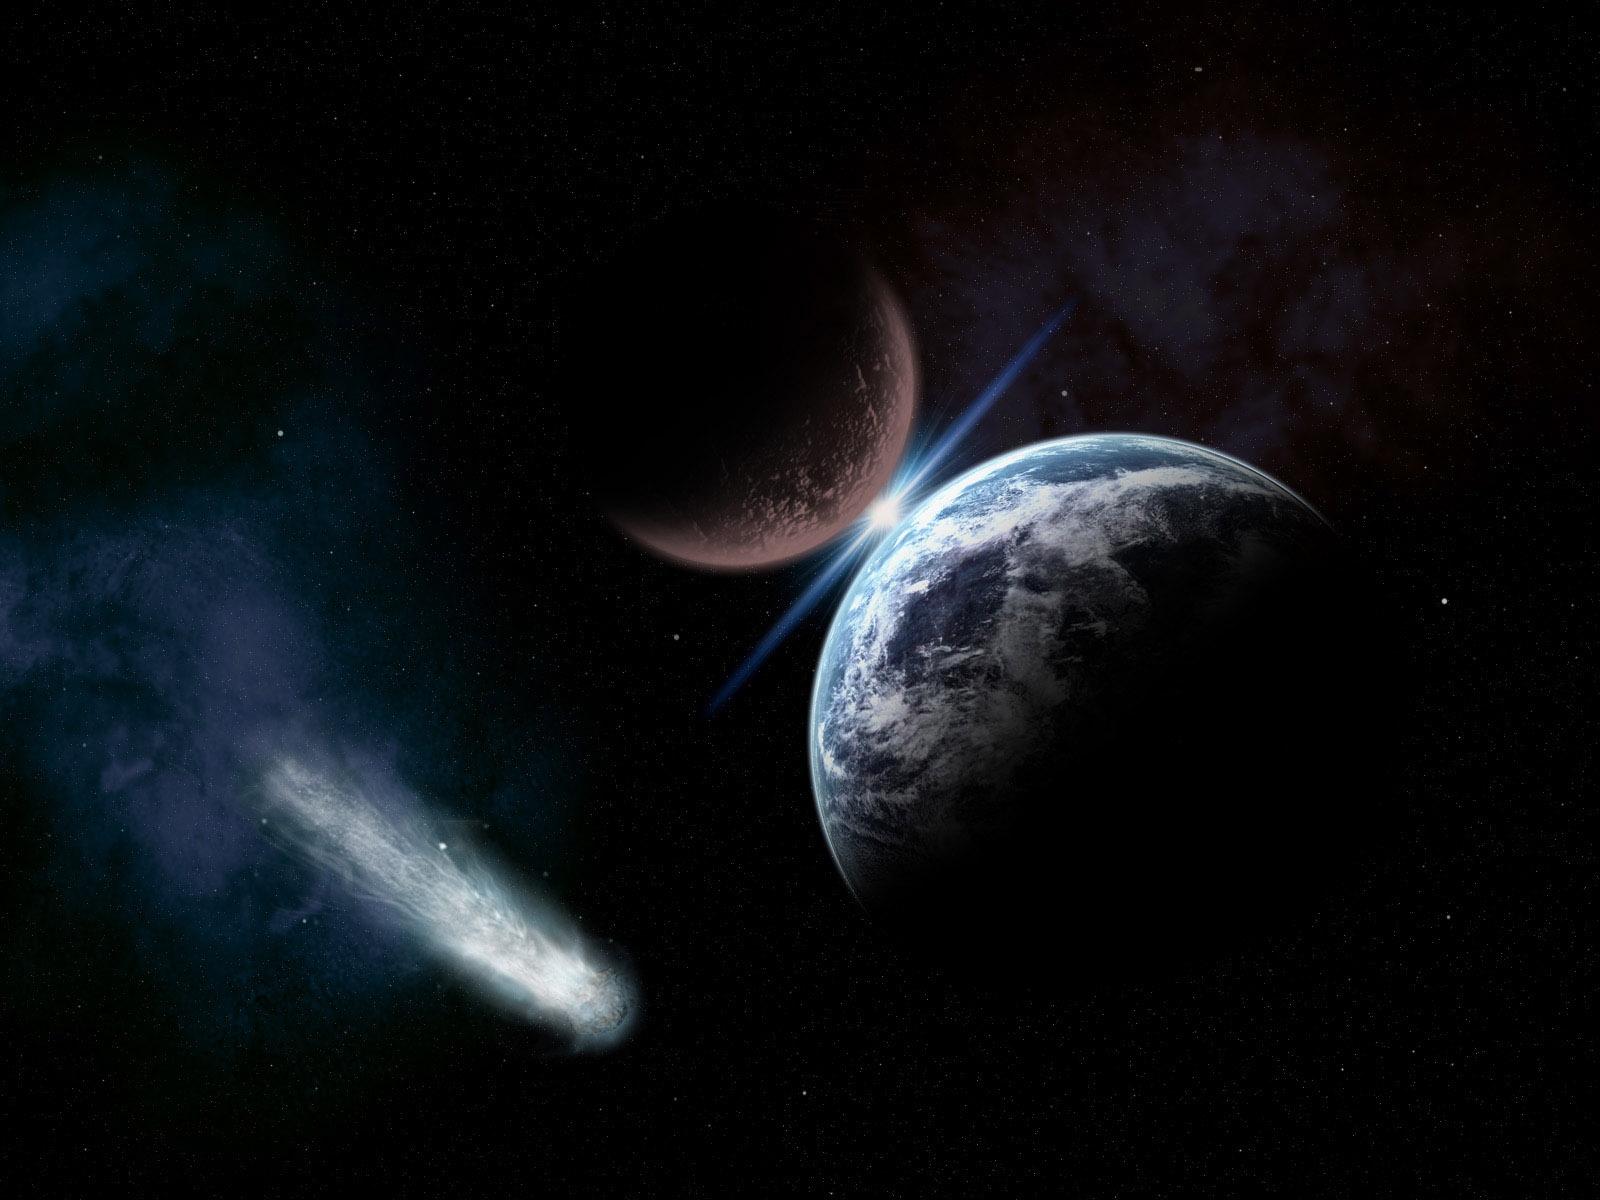 tierra asteroide cometa oscuridad